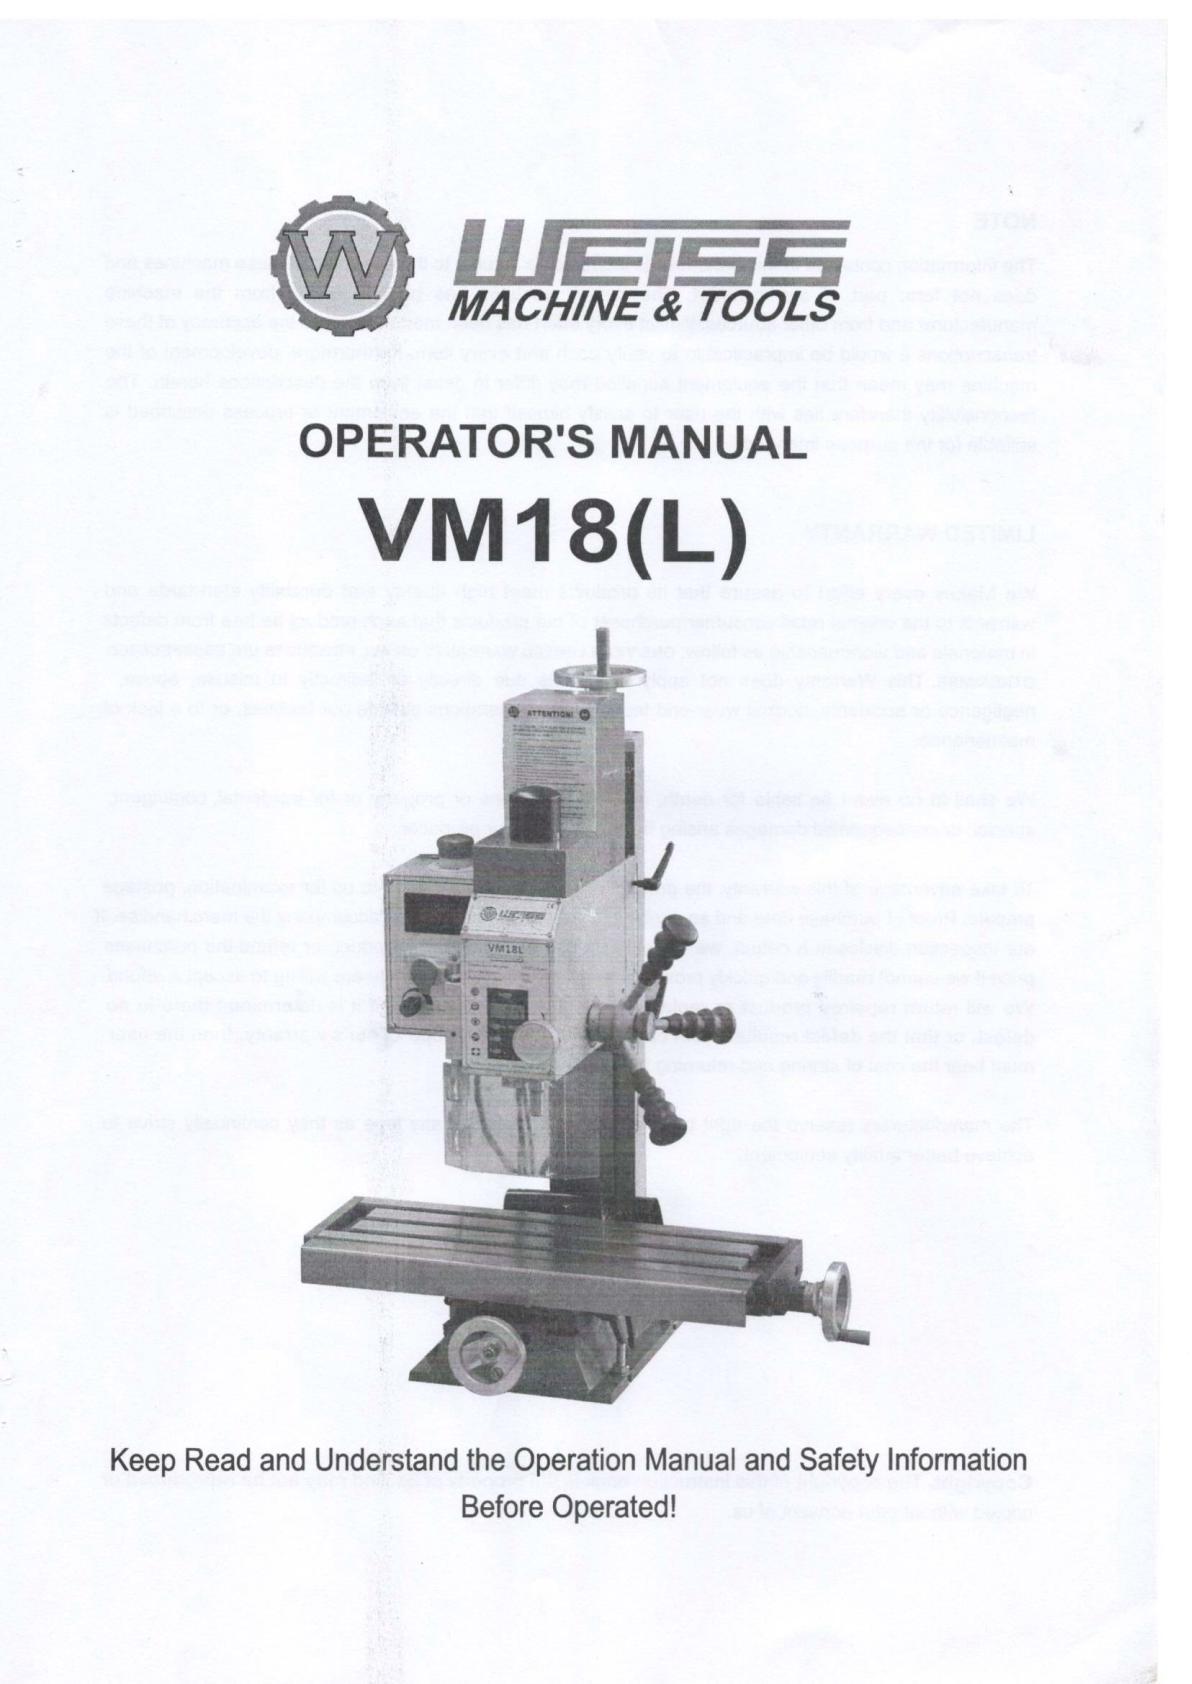 Weiss VM18(L) Uw165